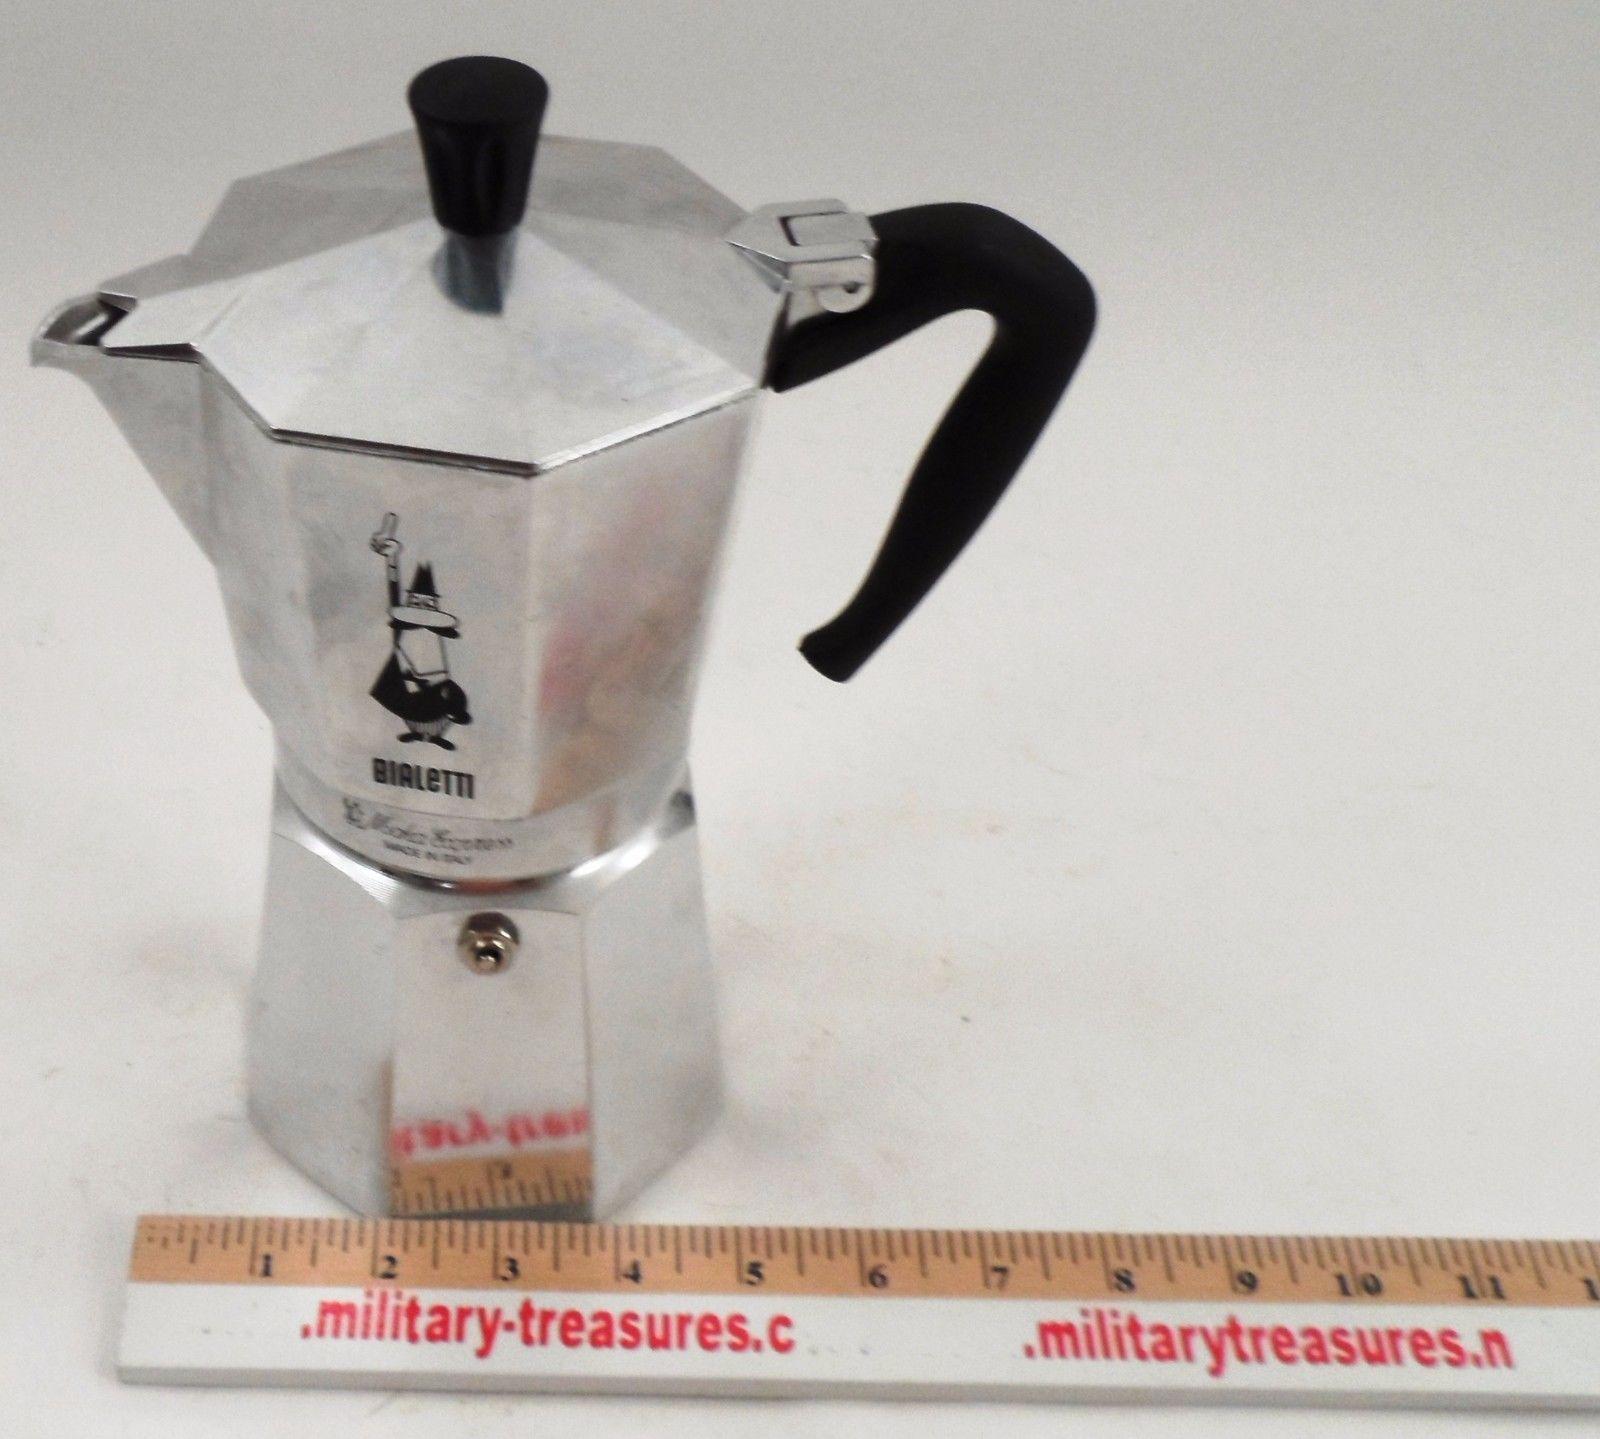 Vguc Classic Bialetti Moka Express 3 Cup Stovetop Espresso Machine